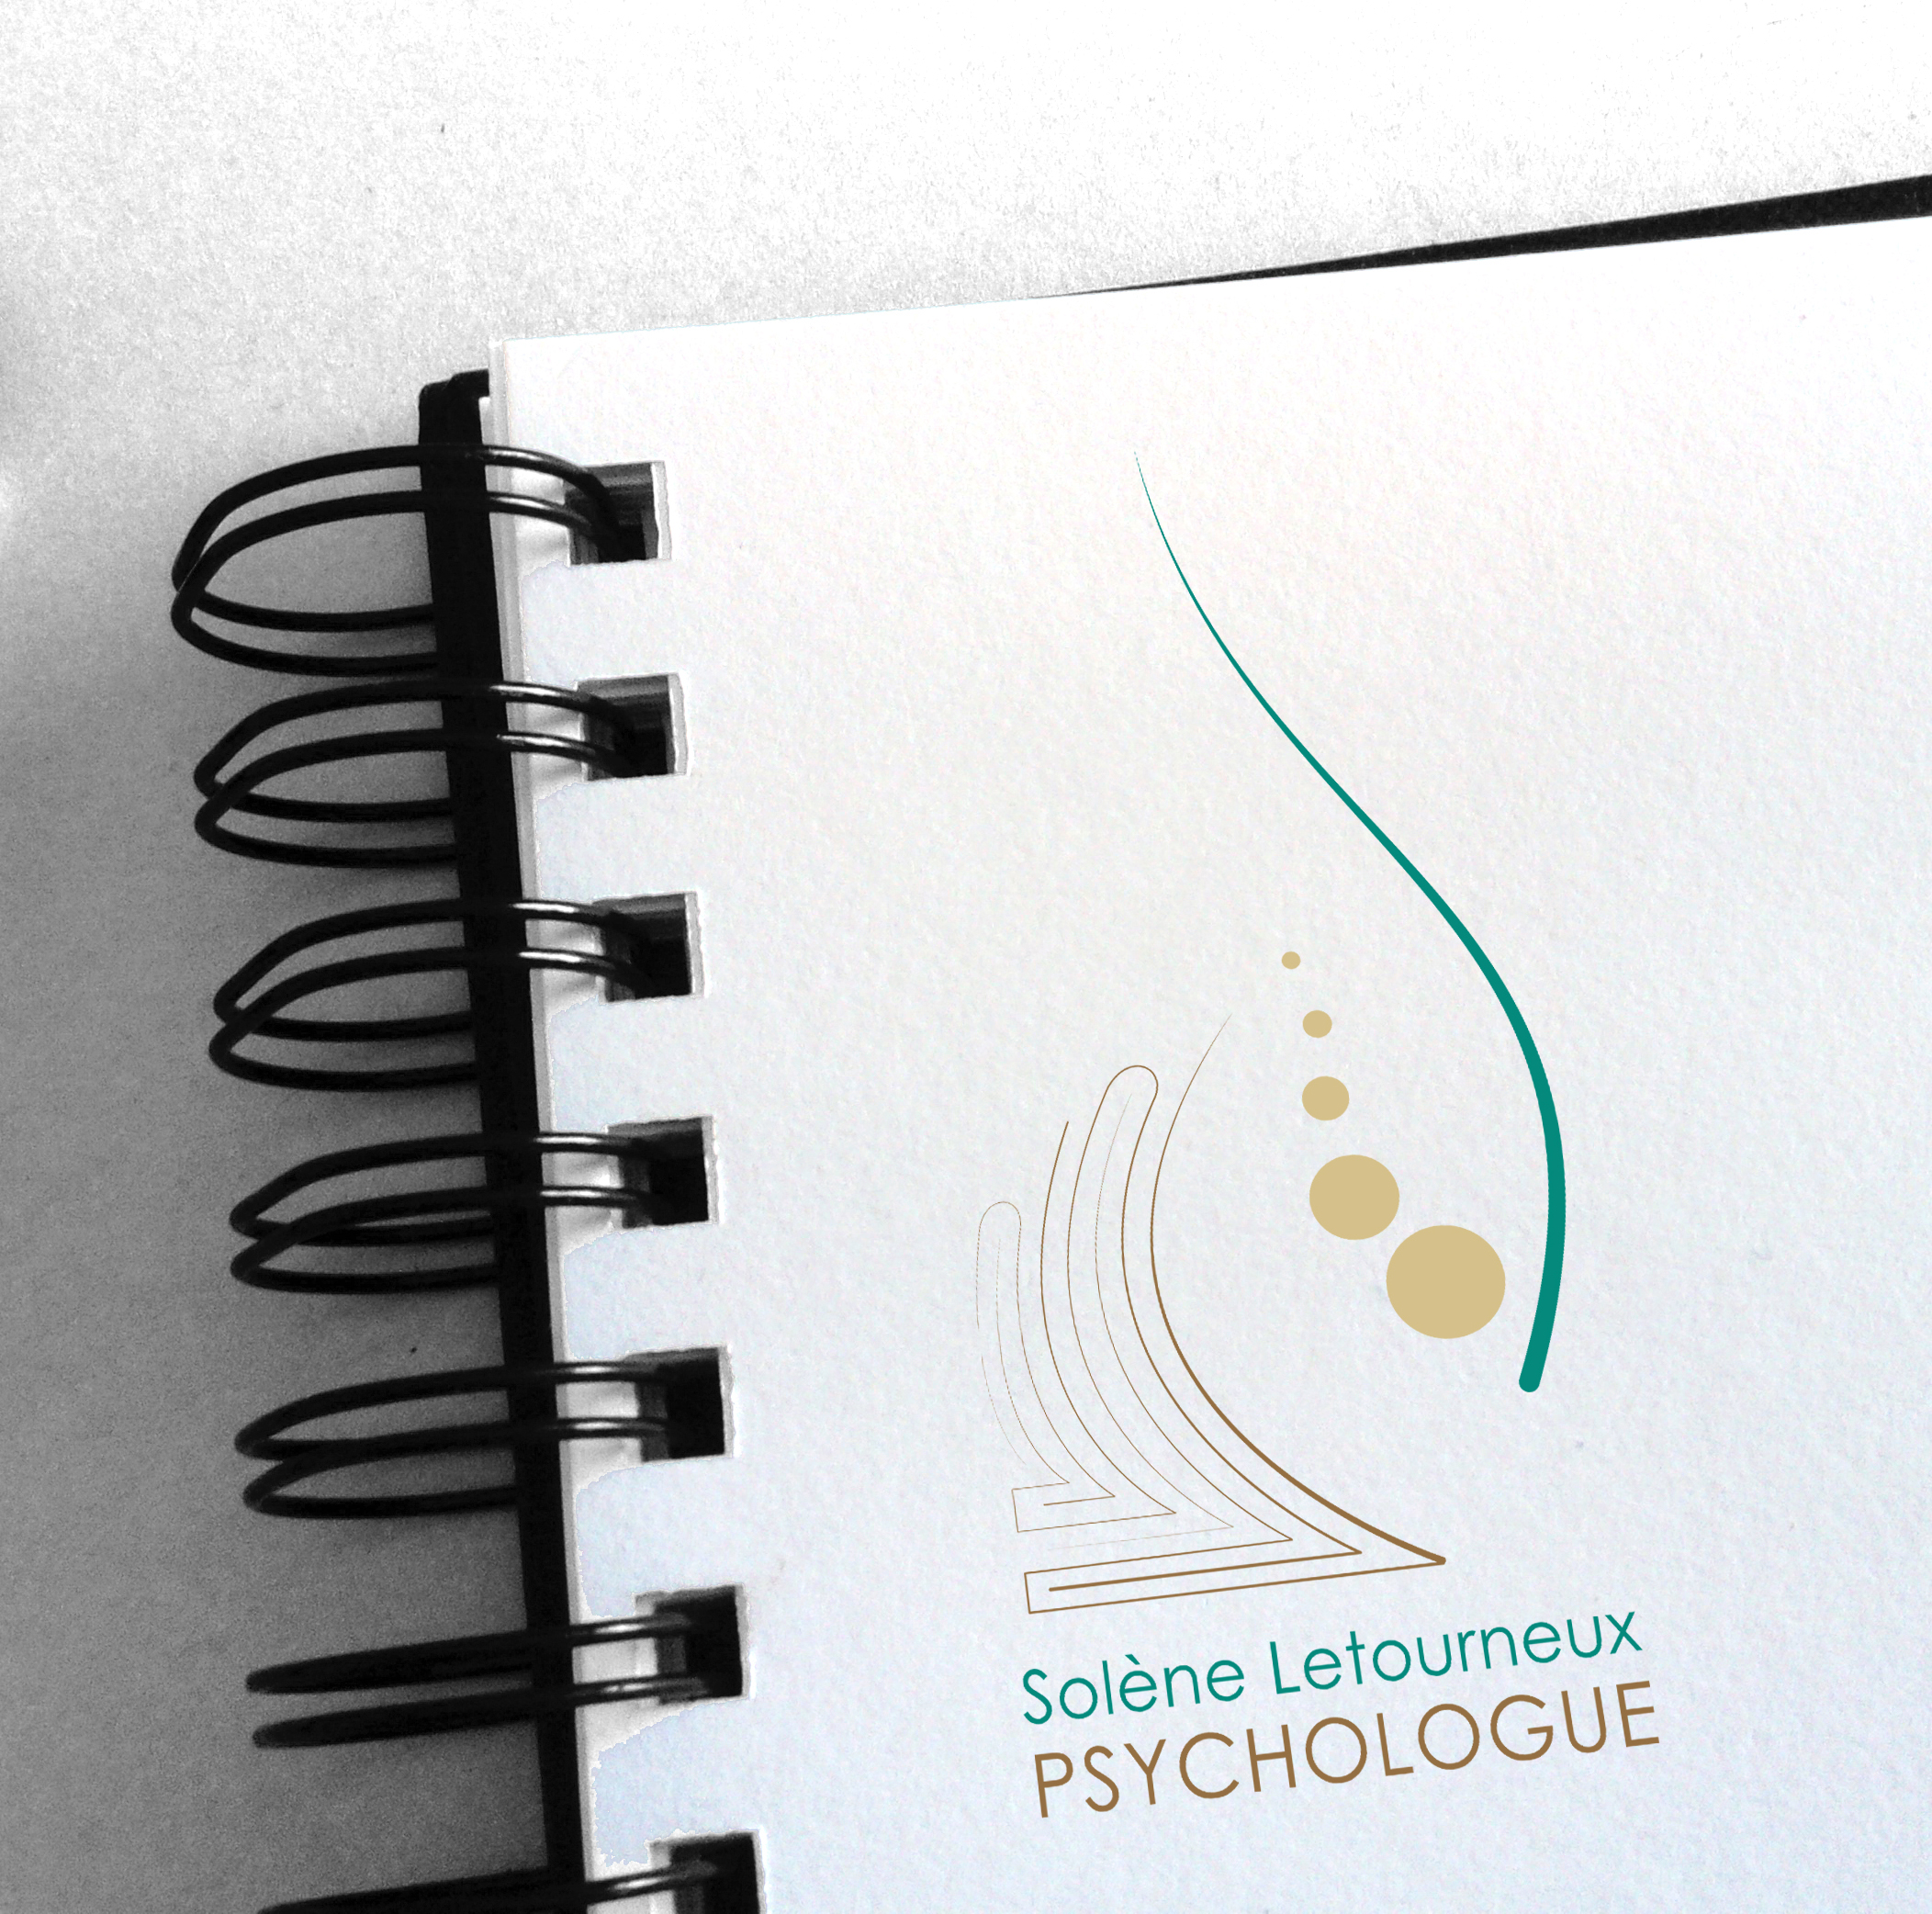 PSYCHOLOGUE